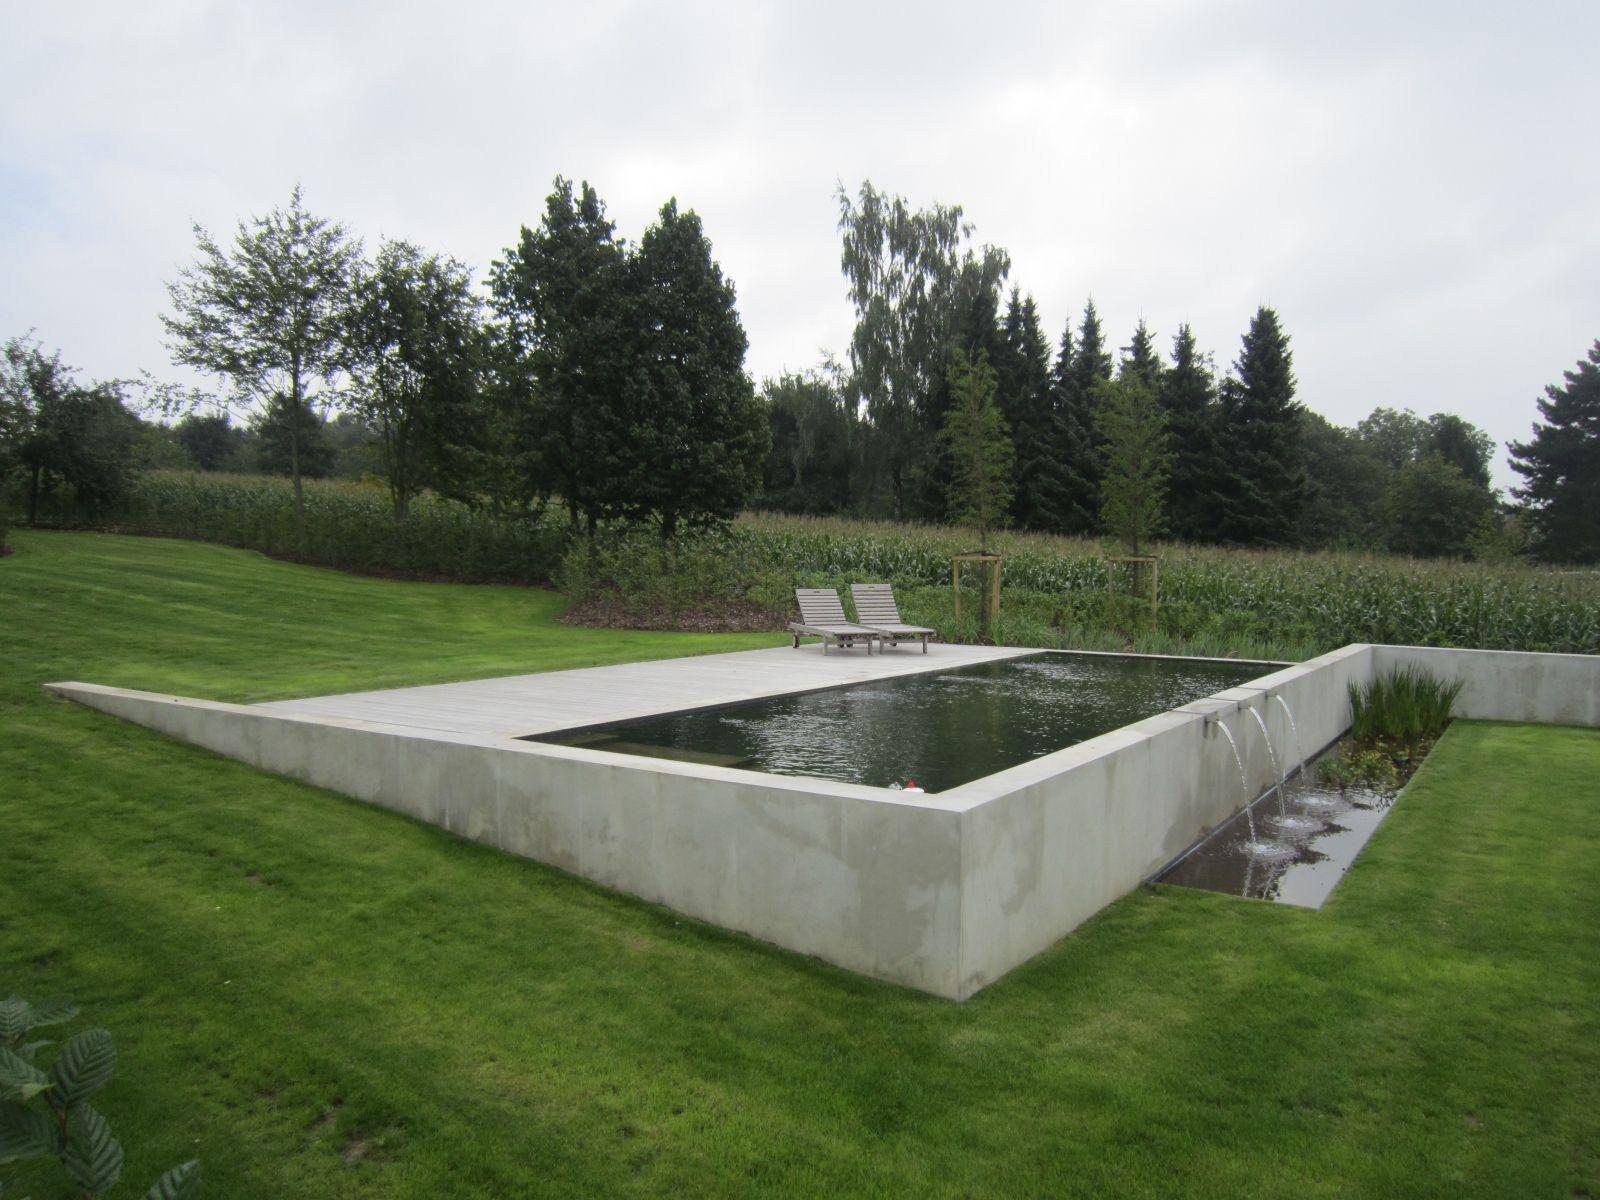 Patrick verbruggen architecture pools swimming pool for Pool design hillside